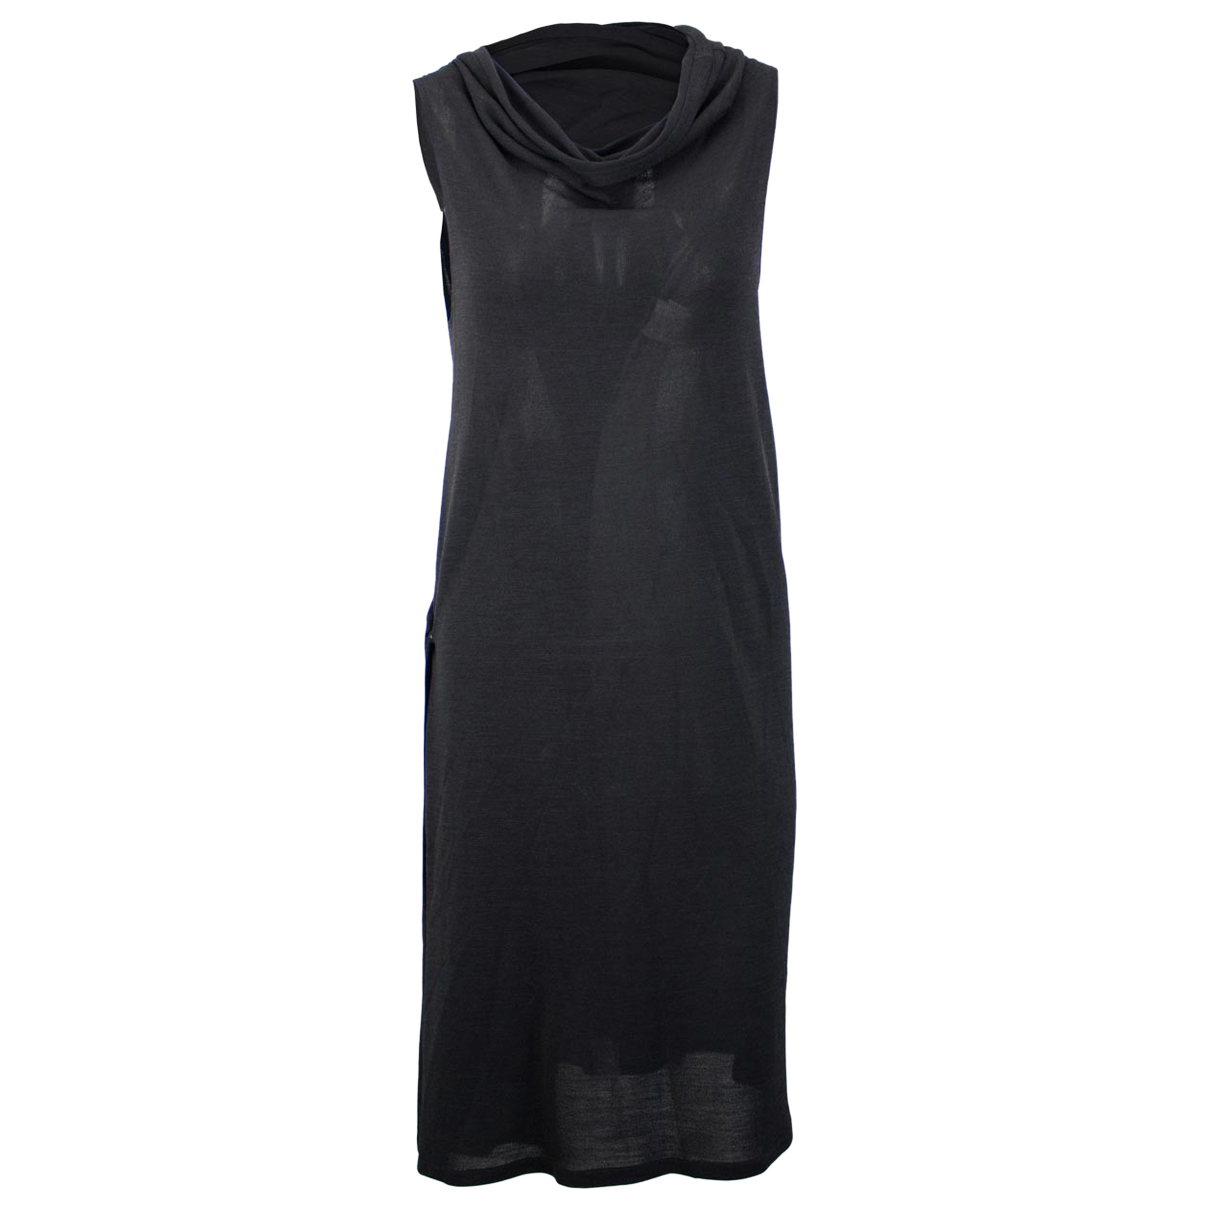 Ann Demeulemeester \N Kleid in  Schwarz Synthetik